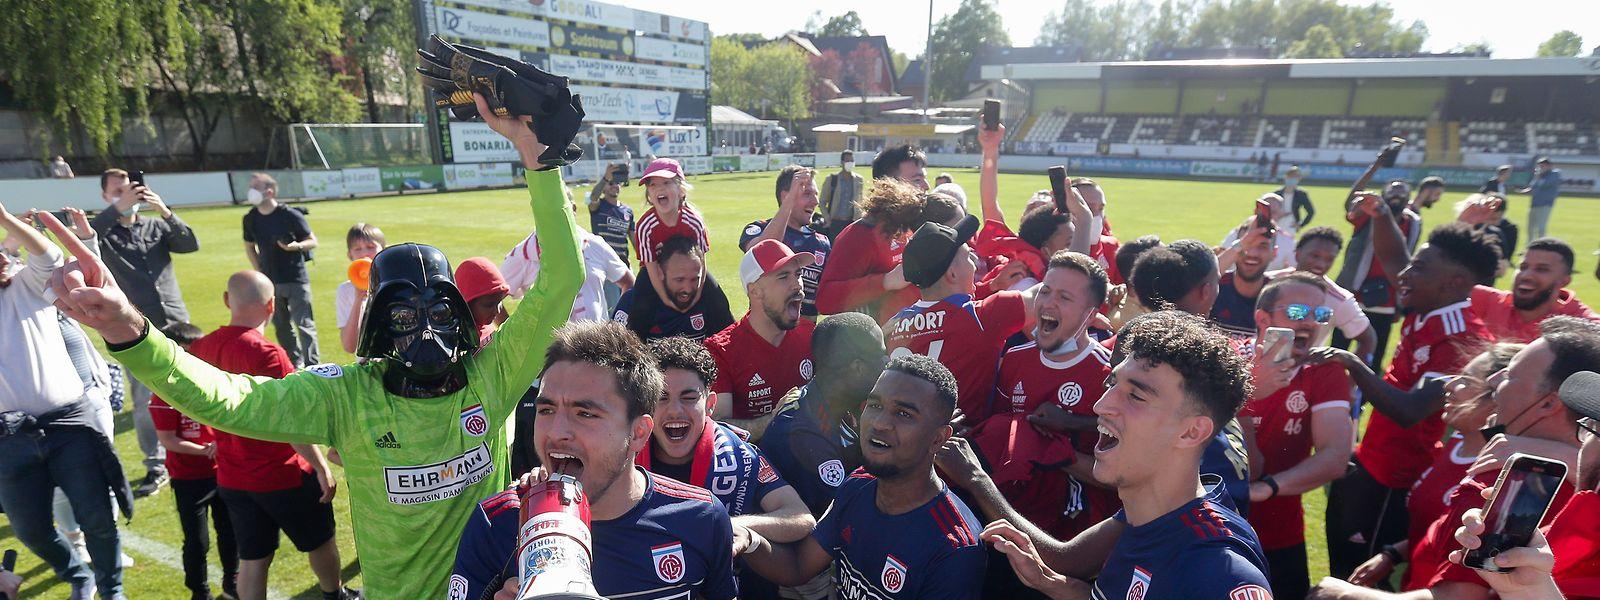 Fola feiert den achten Meistertitel der Vereinsgeschichte.